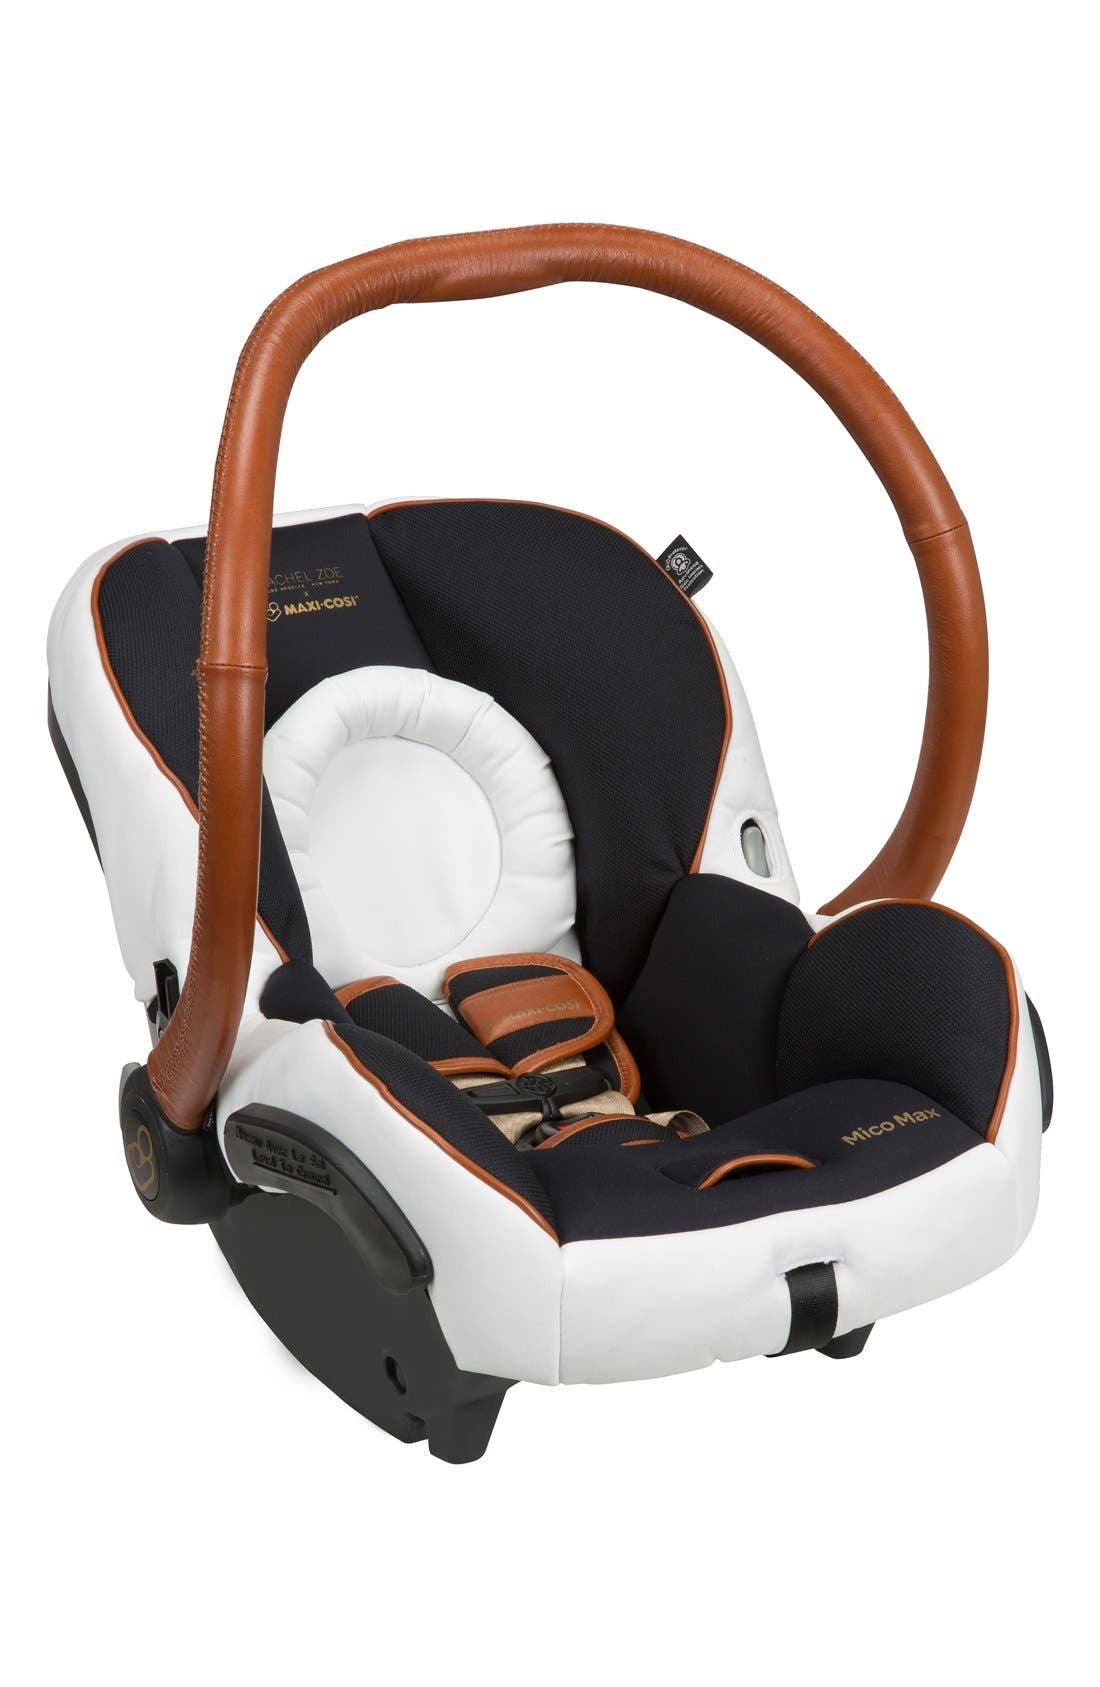 x Rachel Zoe Mico Max 30 - Special Edition Infant Car Seat,                             Main thumbnail 1, color,                             005